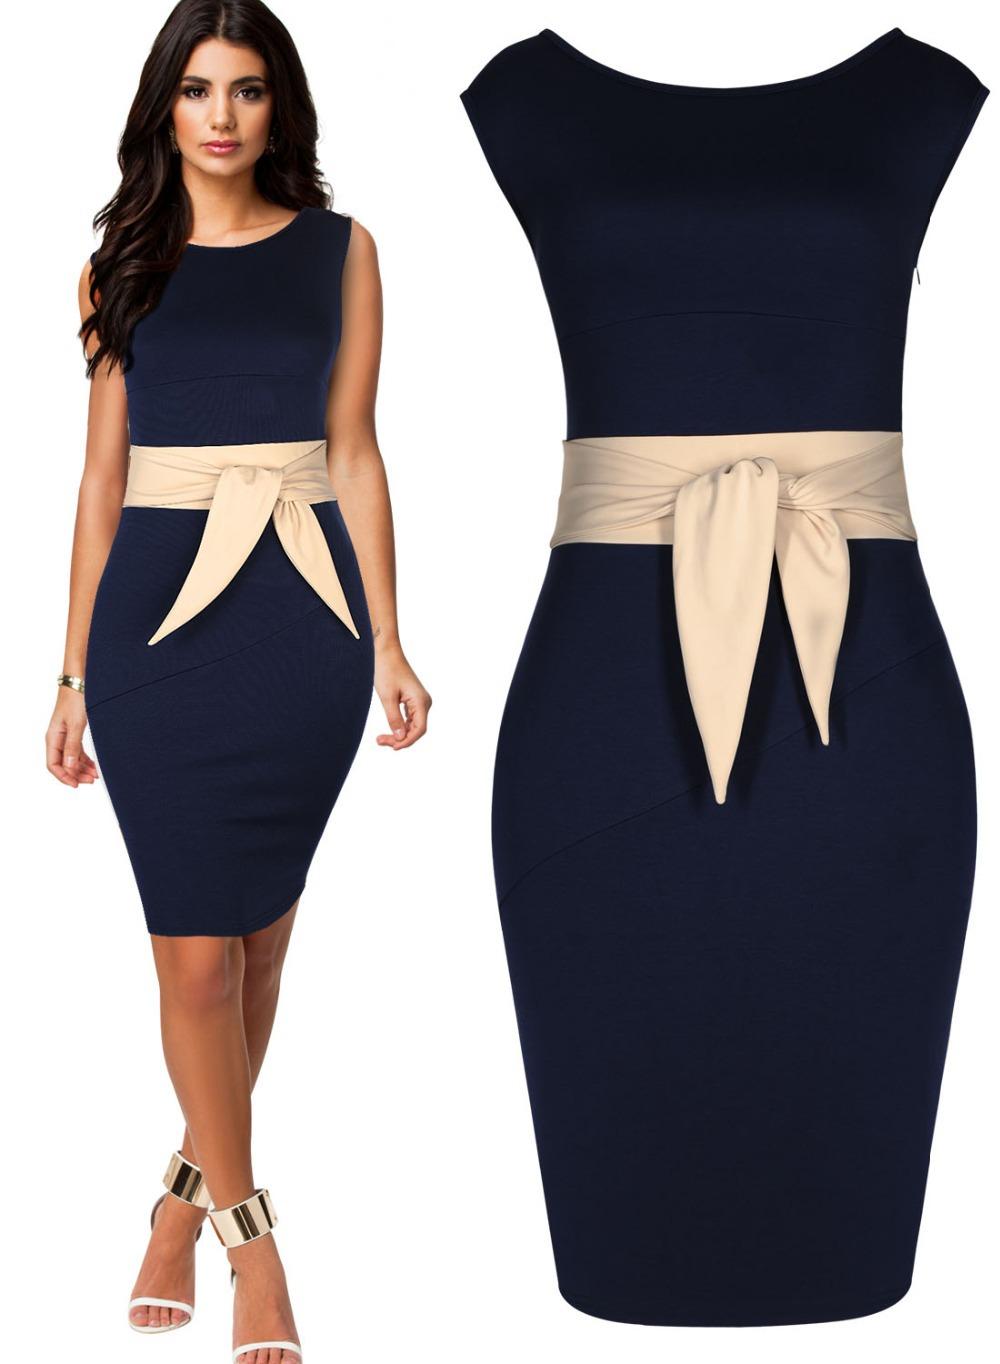 Buy Xs Xxl New Elegant Knee Length Ol Fashion Dress Peplum Sashes Bodycon 2014